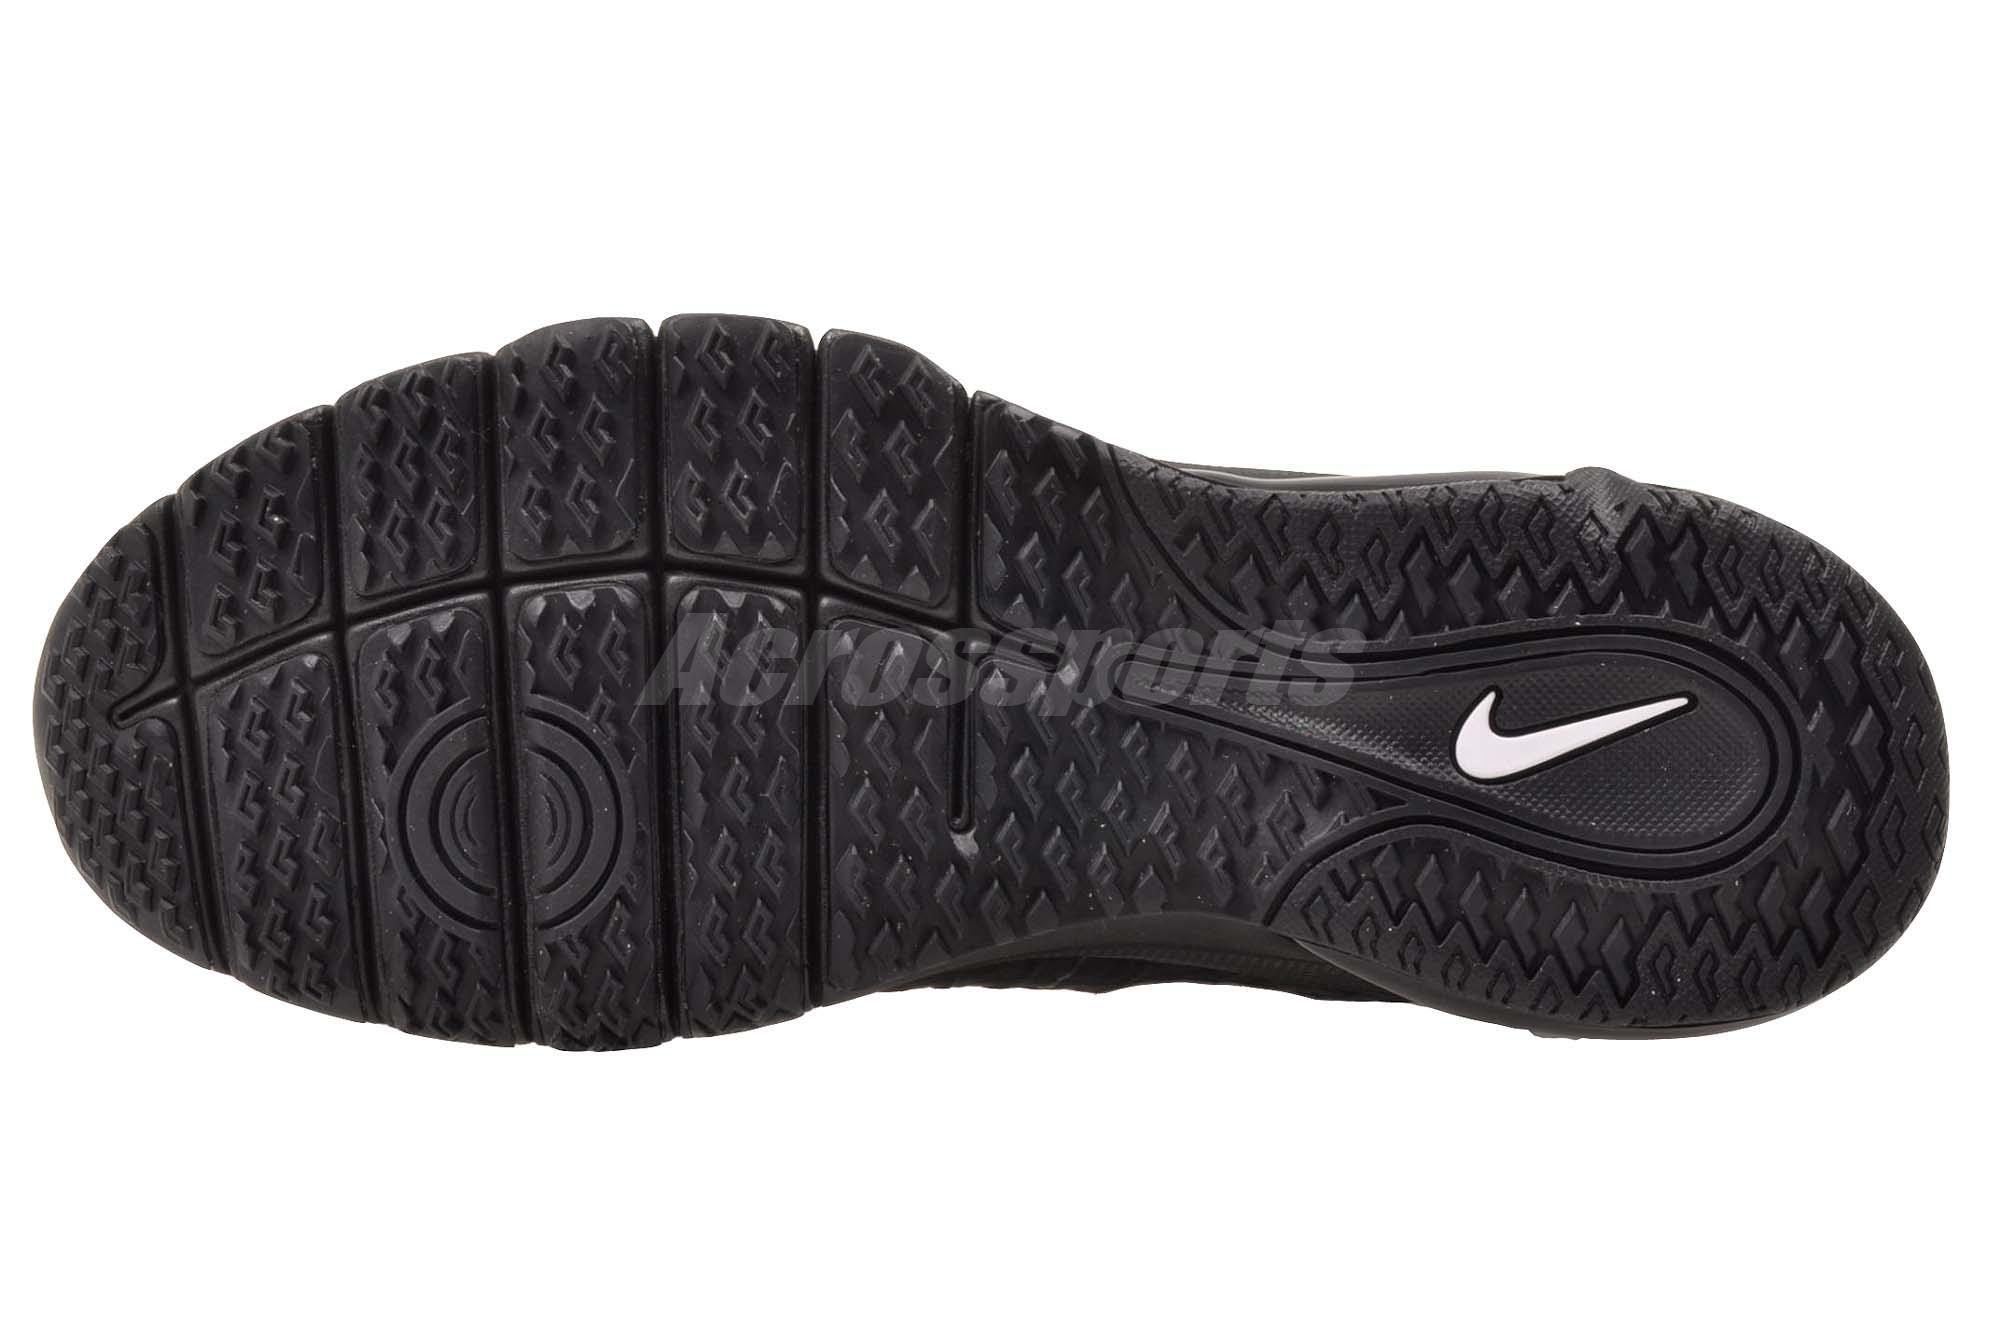 2adc2e3c0d766a Nike Air Max TR180 TB Cross Training Mens Shoes Black 2016